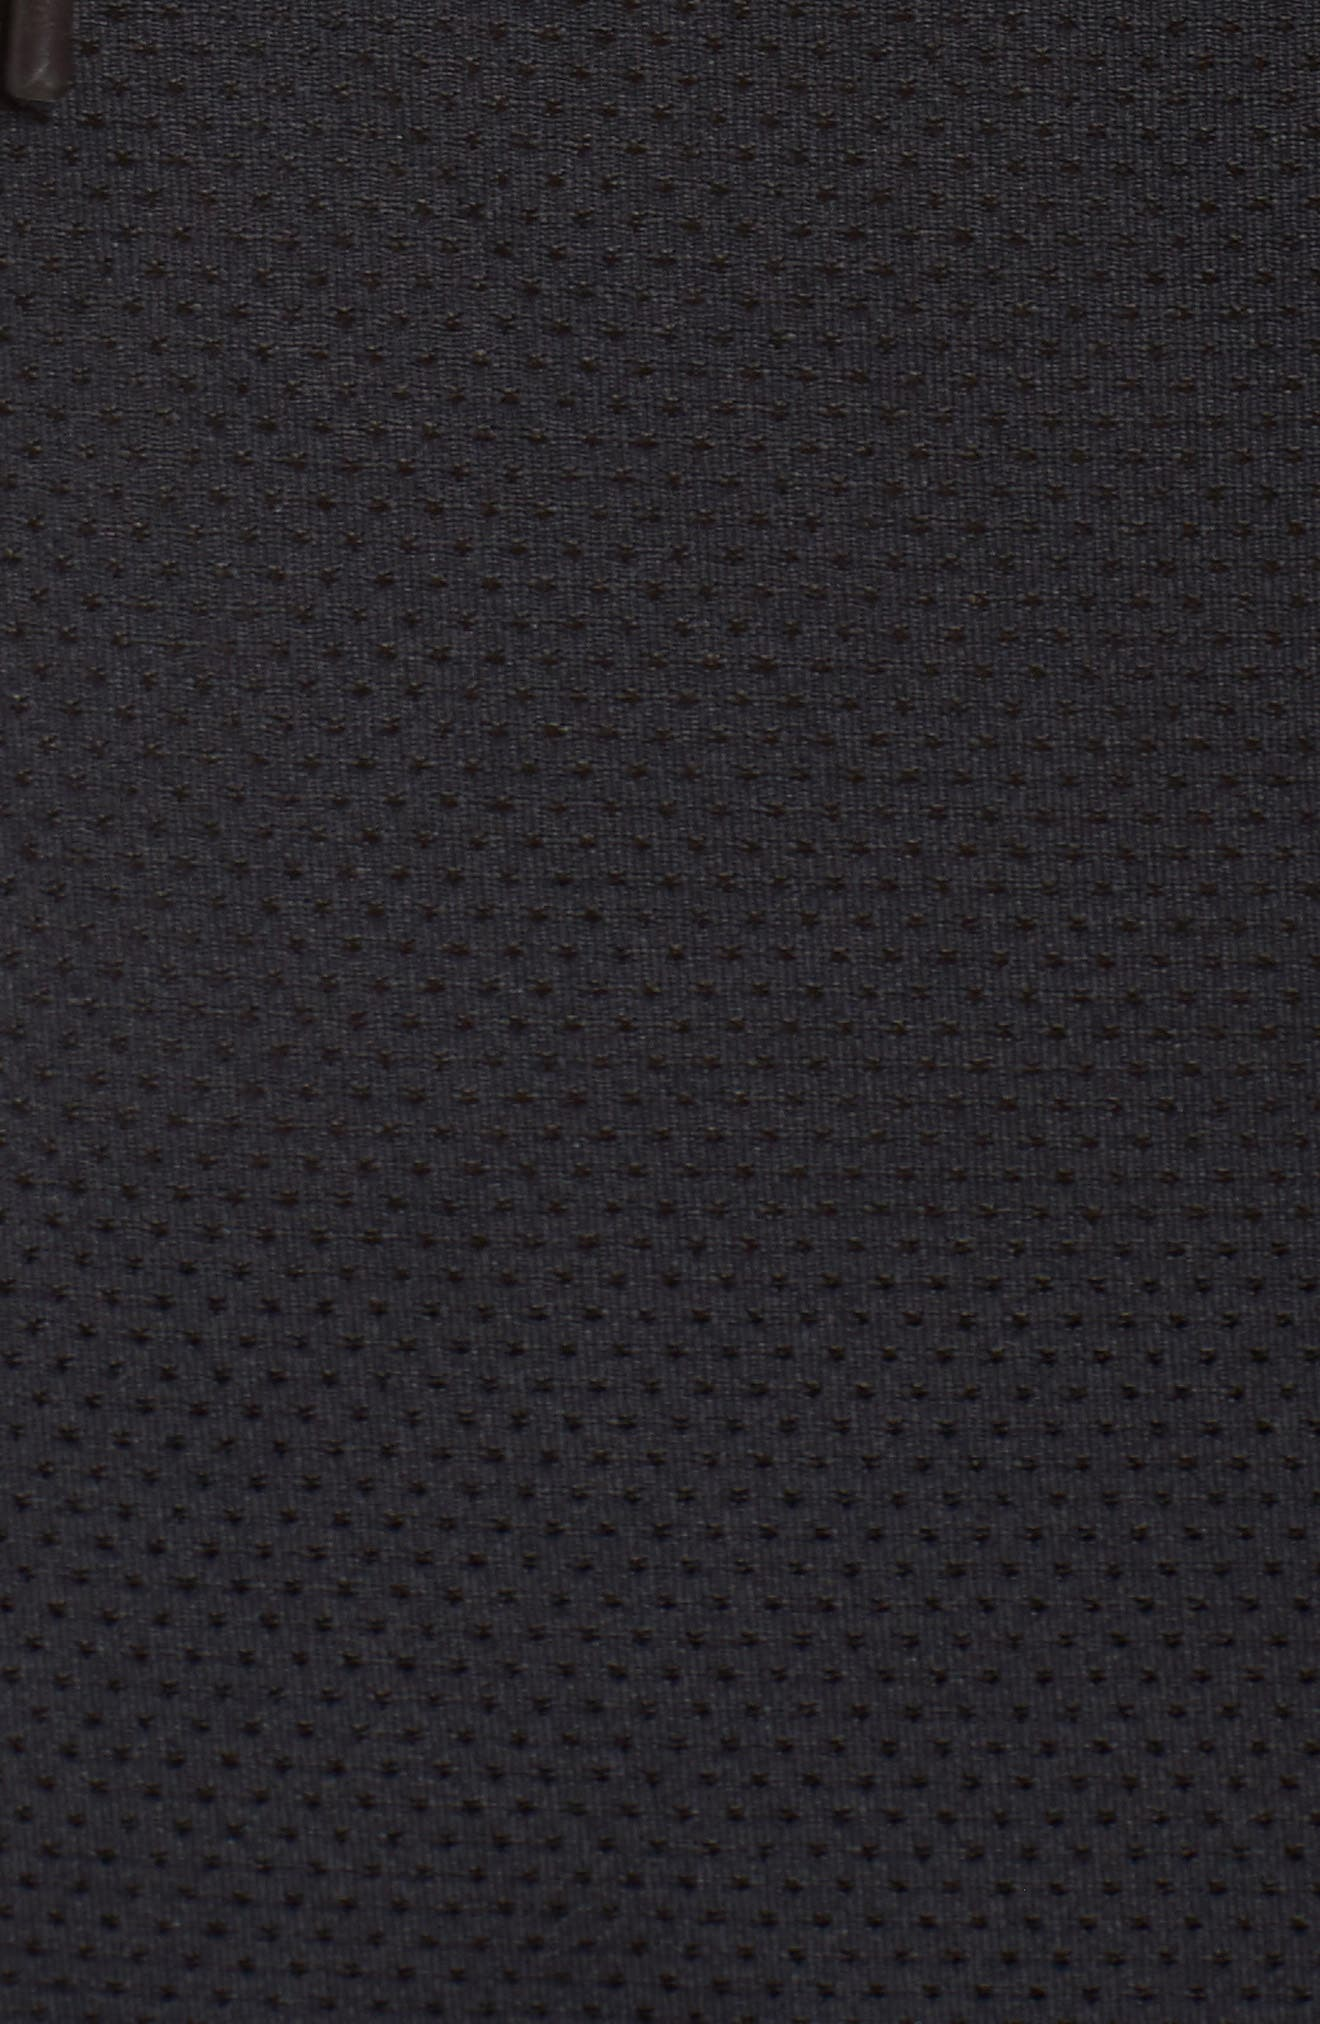 Endurance Hoodie Vest,                             Alternate thumbnail 6, color,                             001